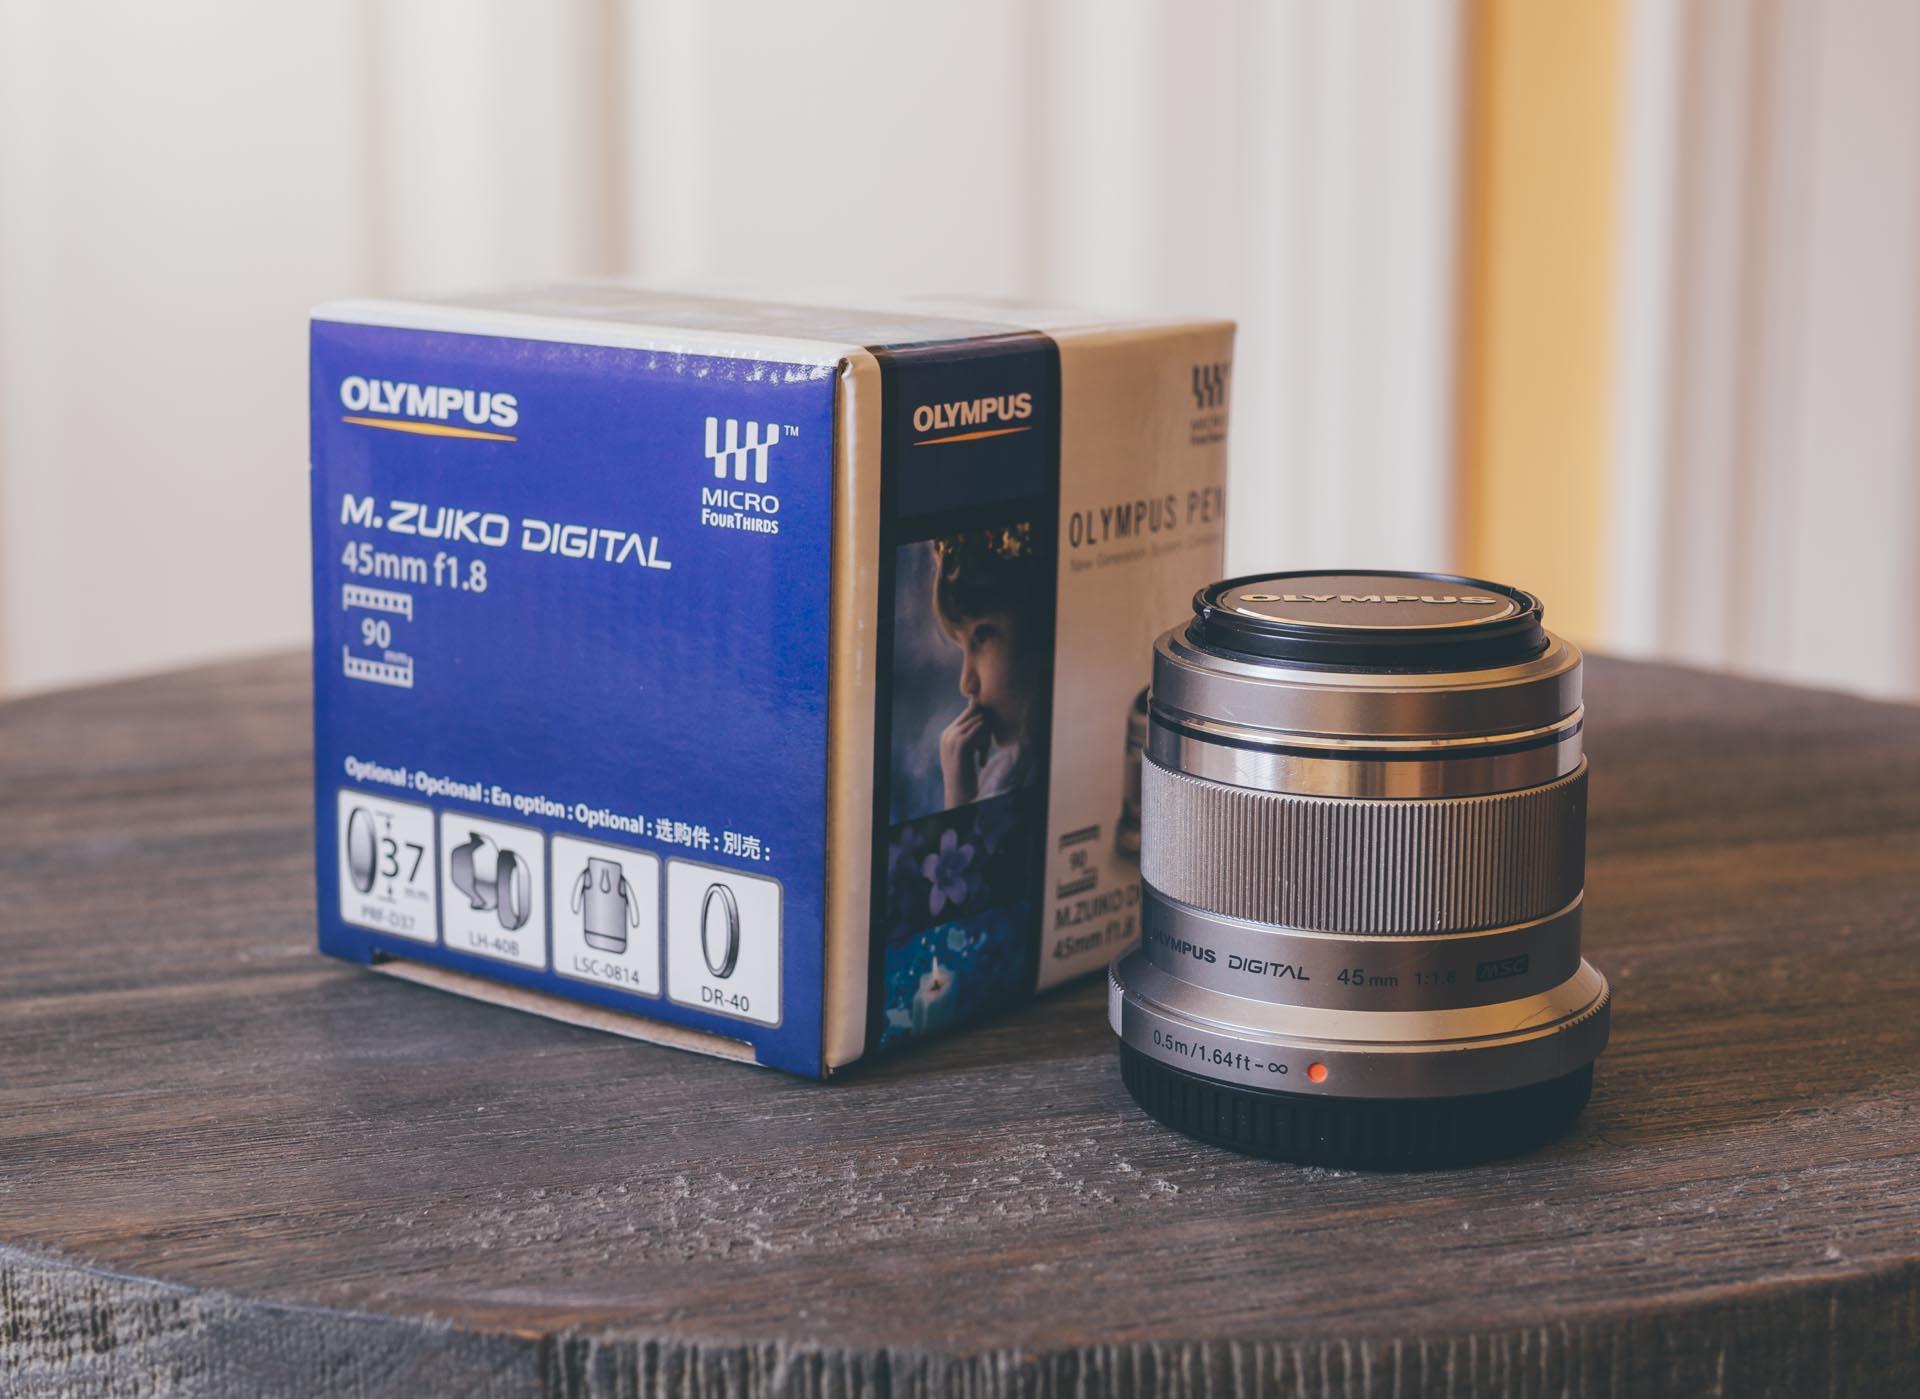 Olympus 45mm f1.8 Lens